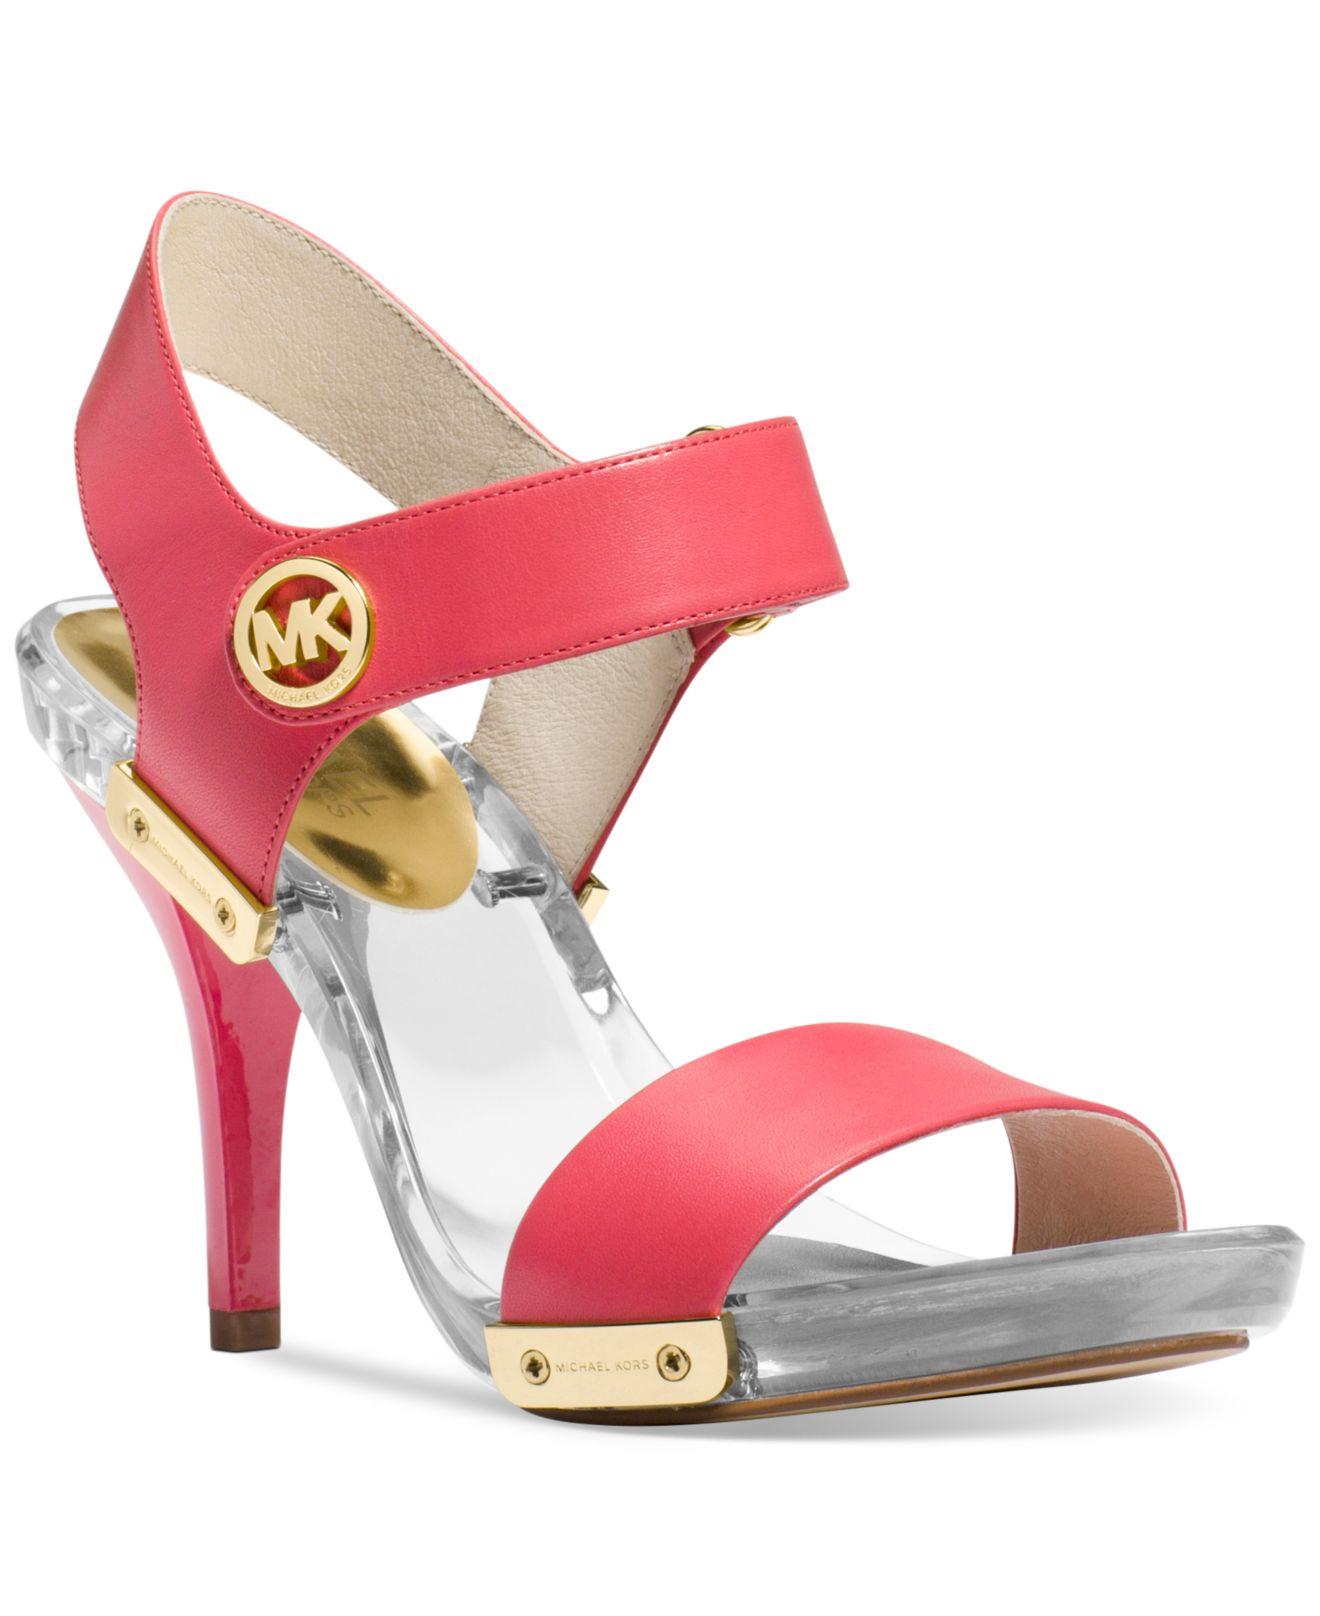 0c0da1acb4cf ... Macys Lyst - Michael Kors Michael Lani Platform Sandals in Pink ...